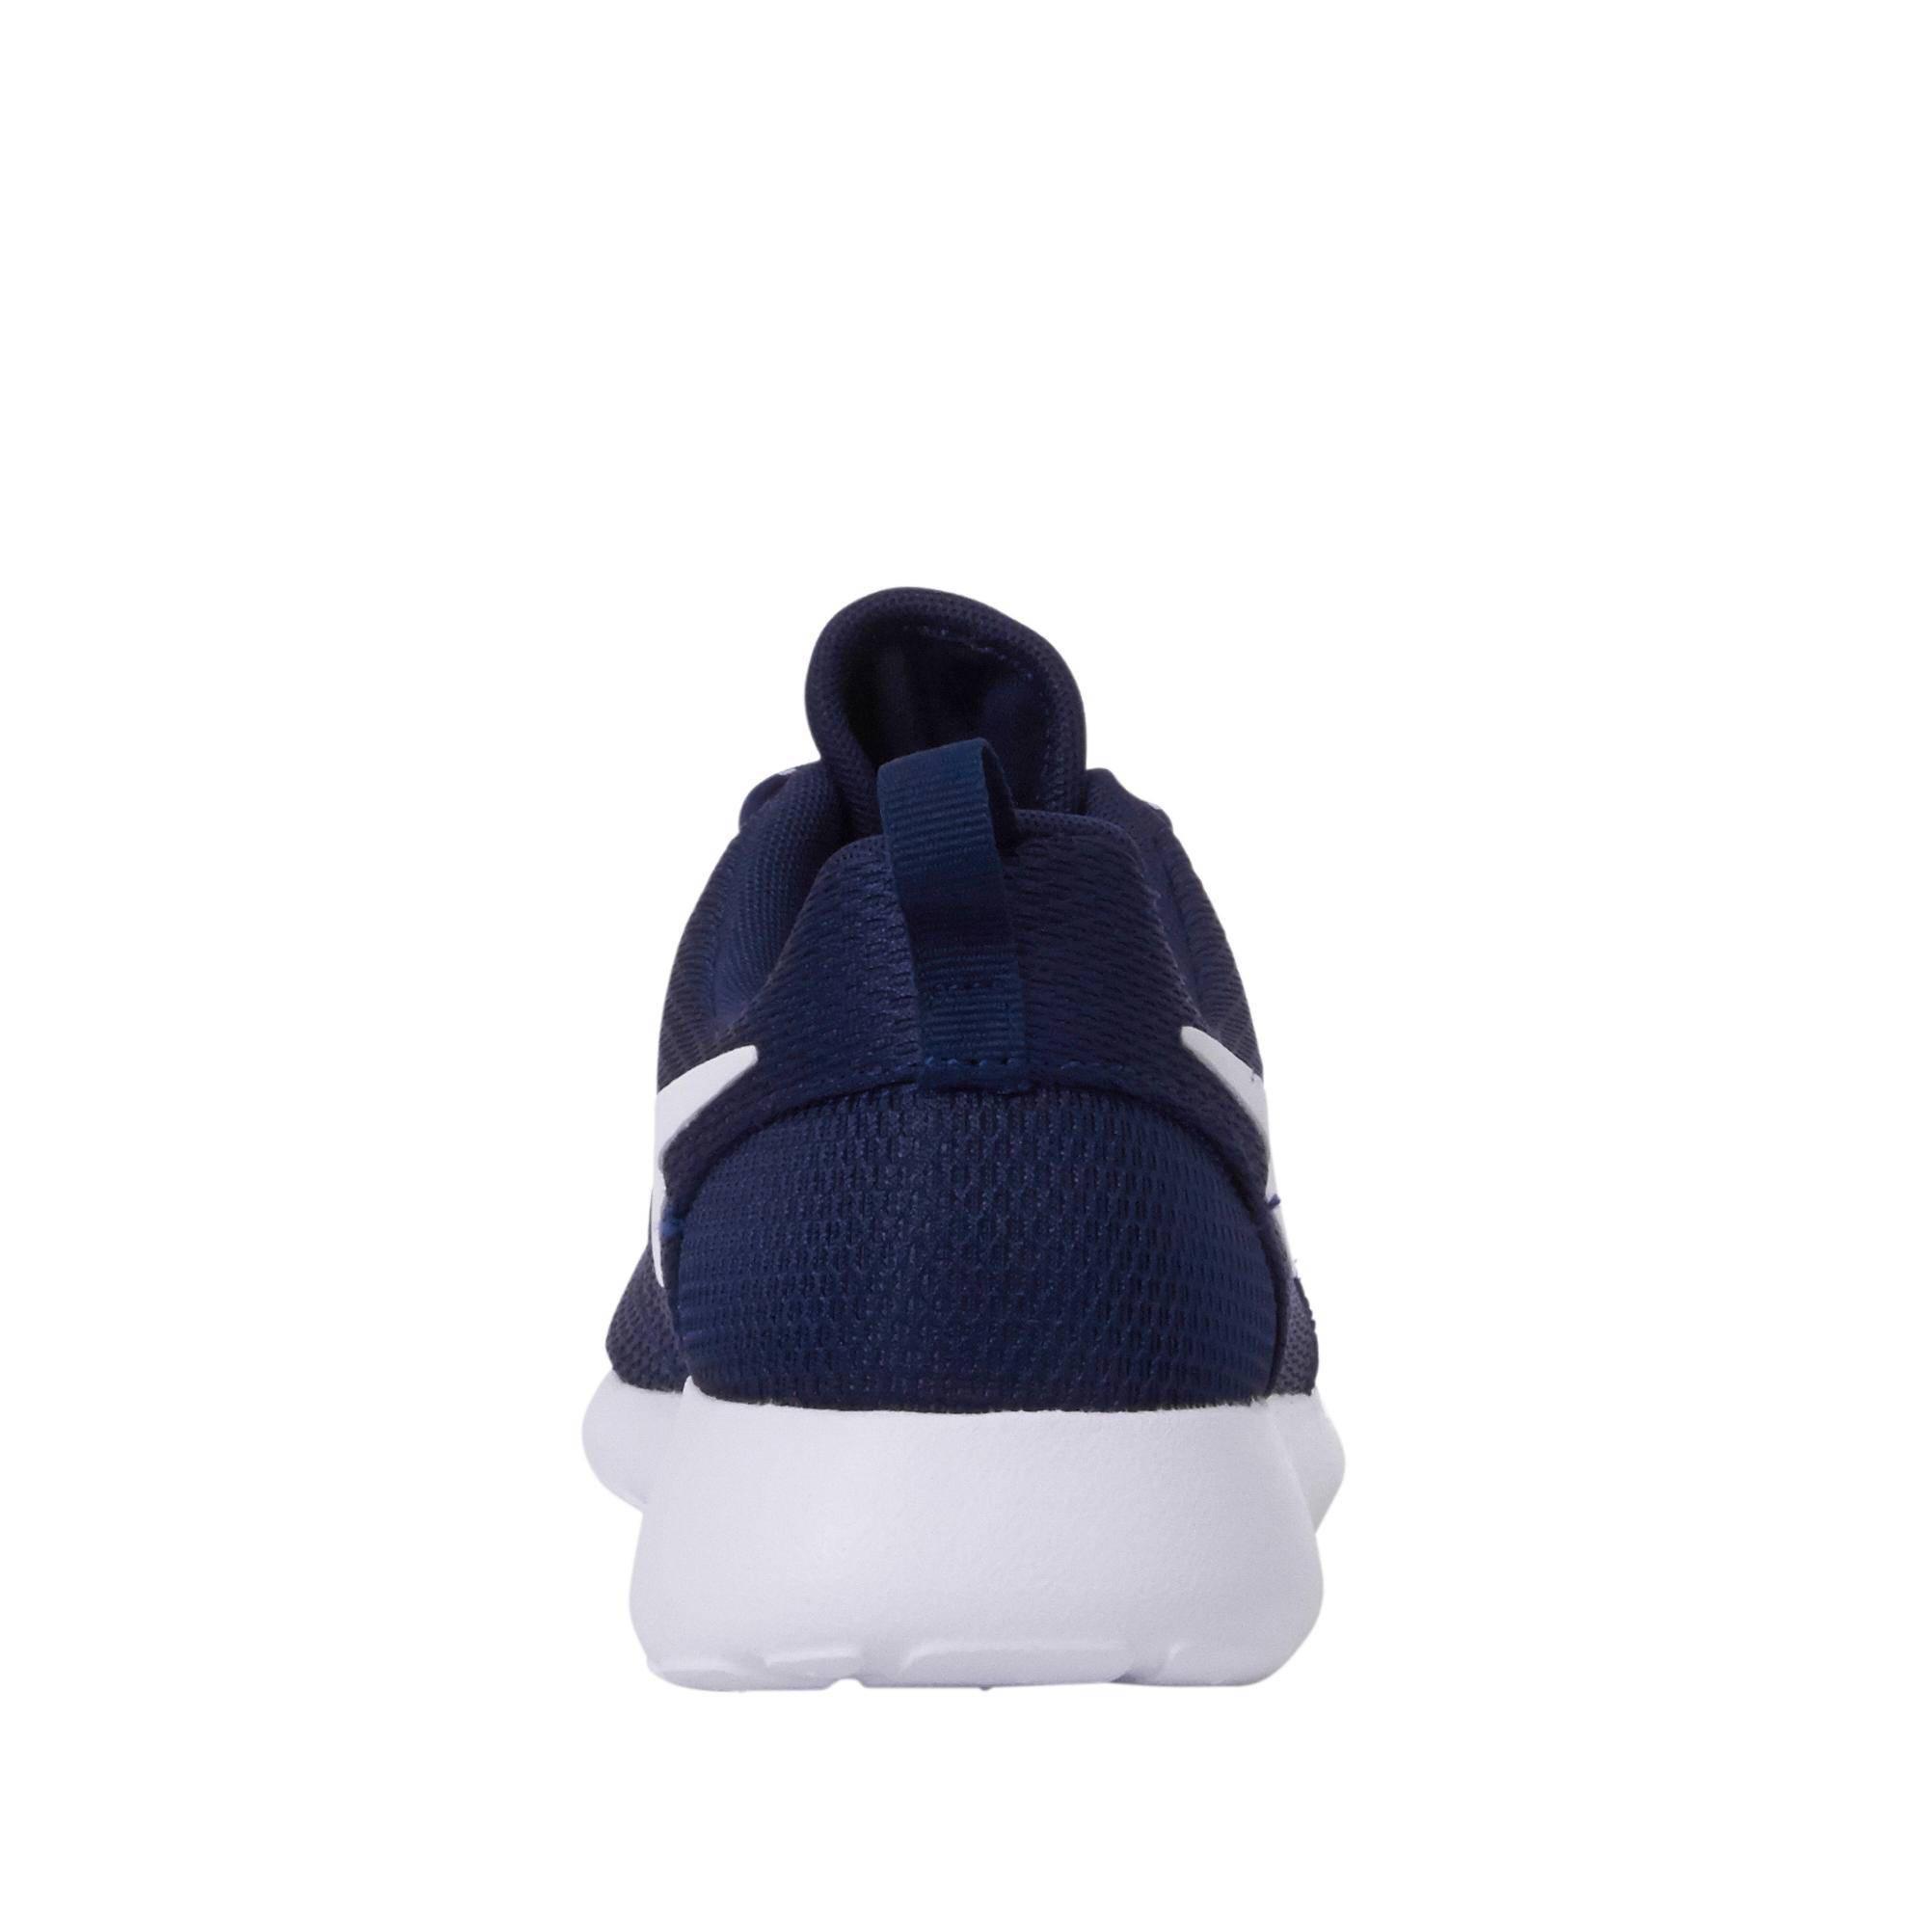 321f94626cd0d7 nike-sneakers-roshe-one-blauw-0886549606640.jpg